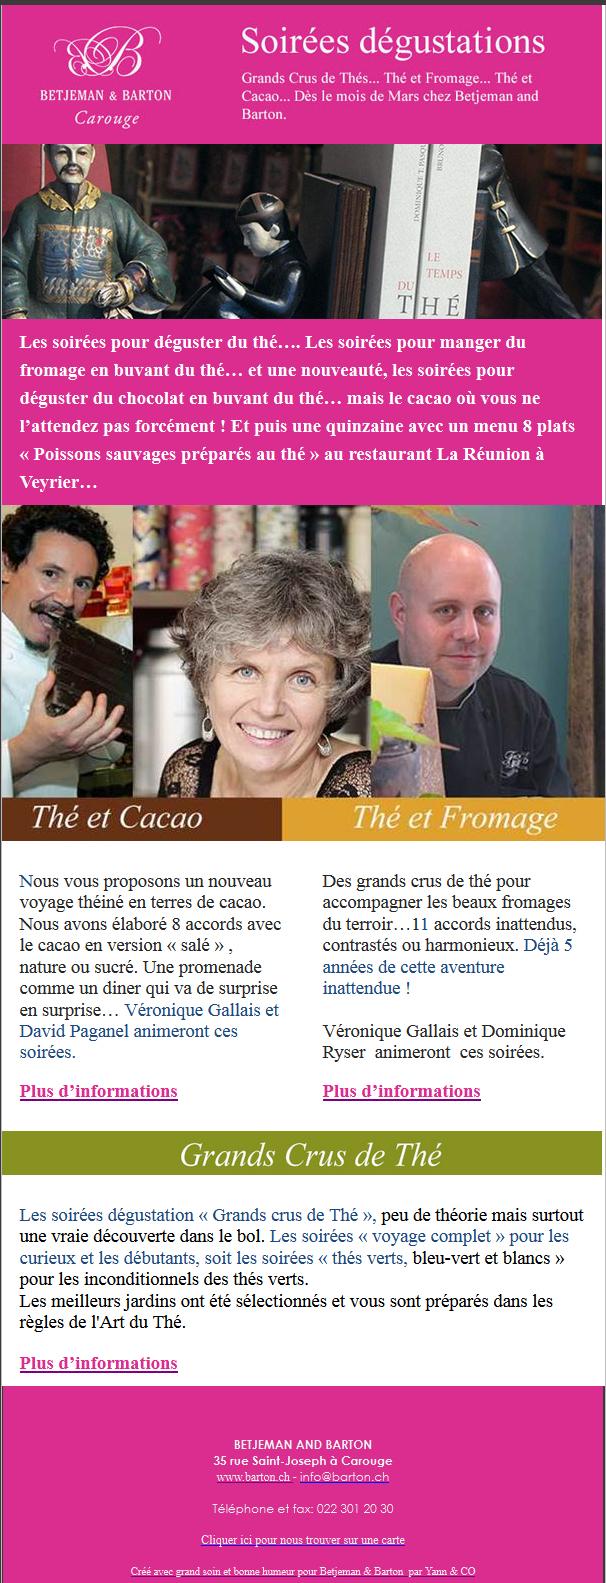 201303-newsletters.soireesdeustations.jpg